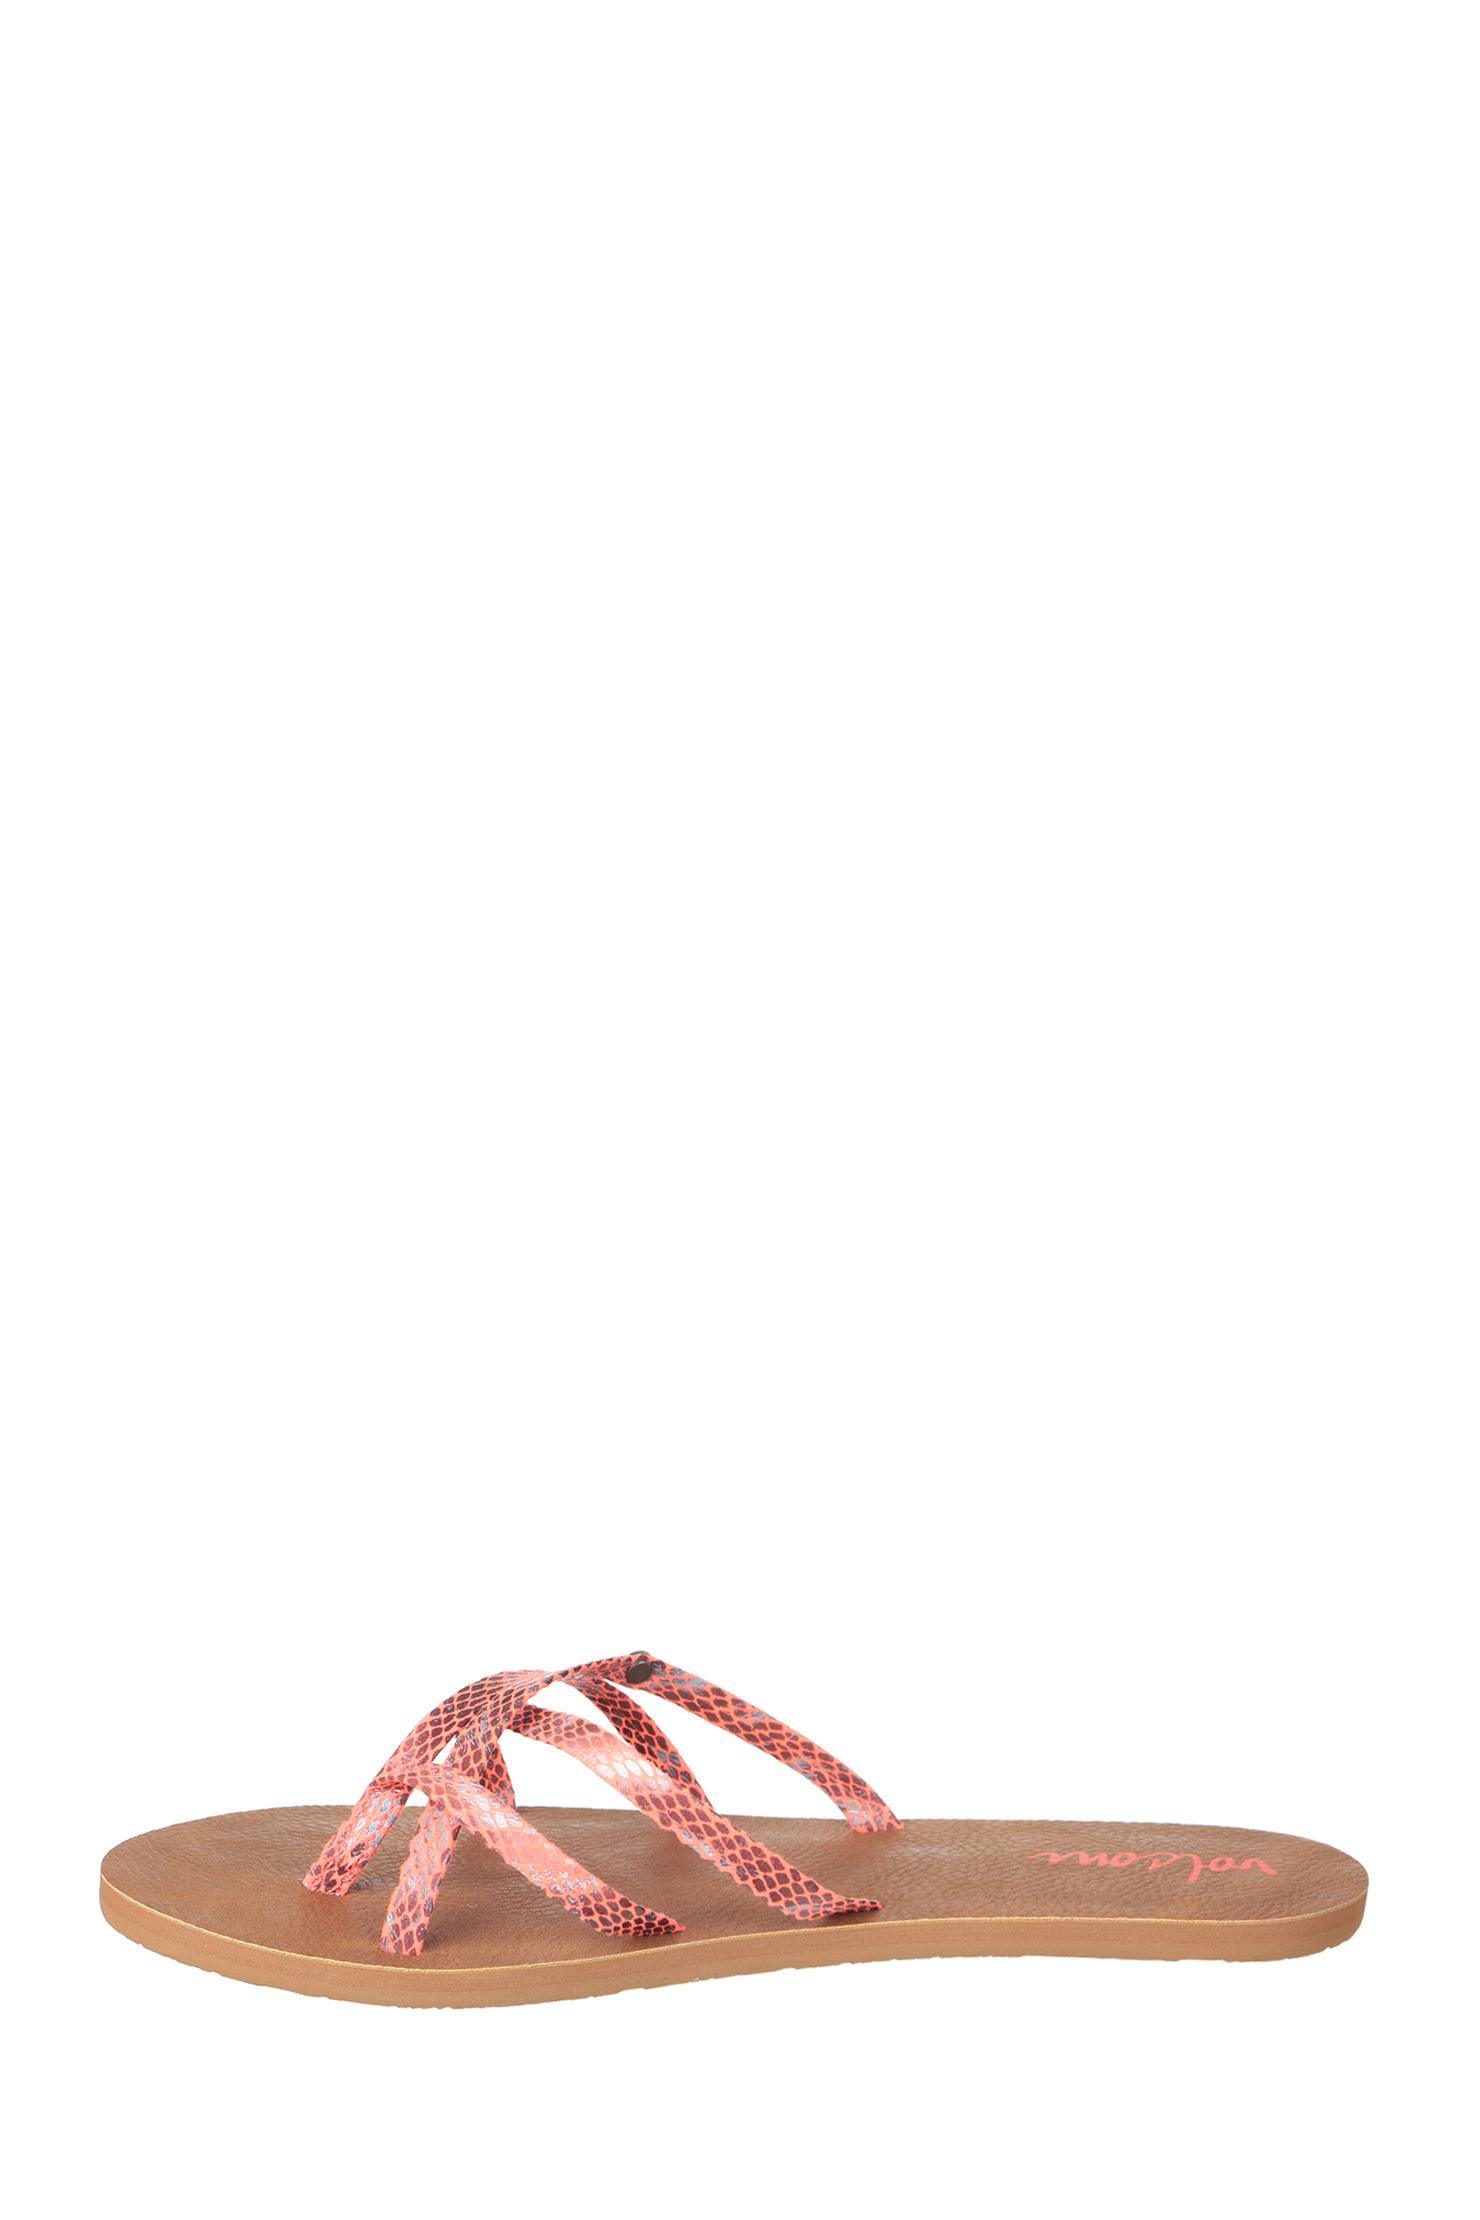 volcom sandals in pink lyst